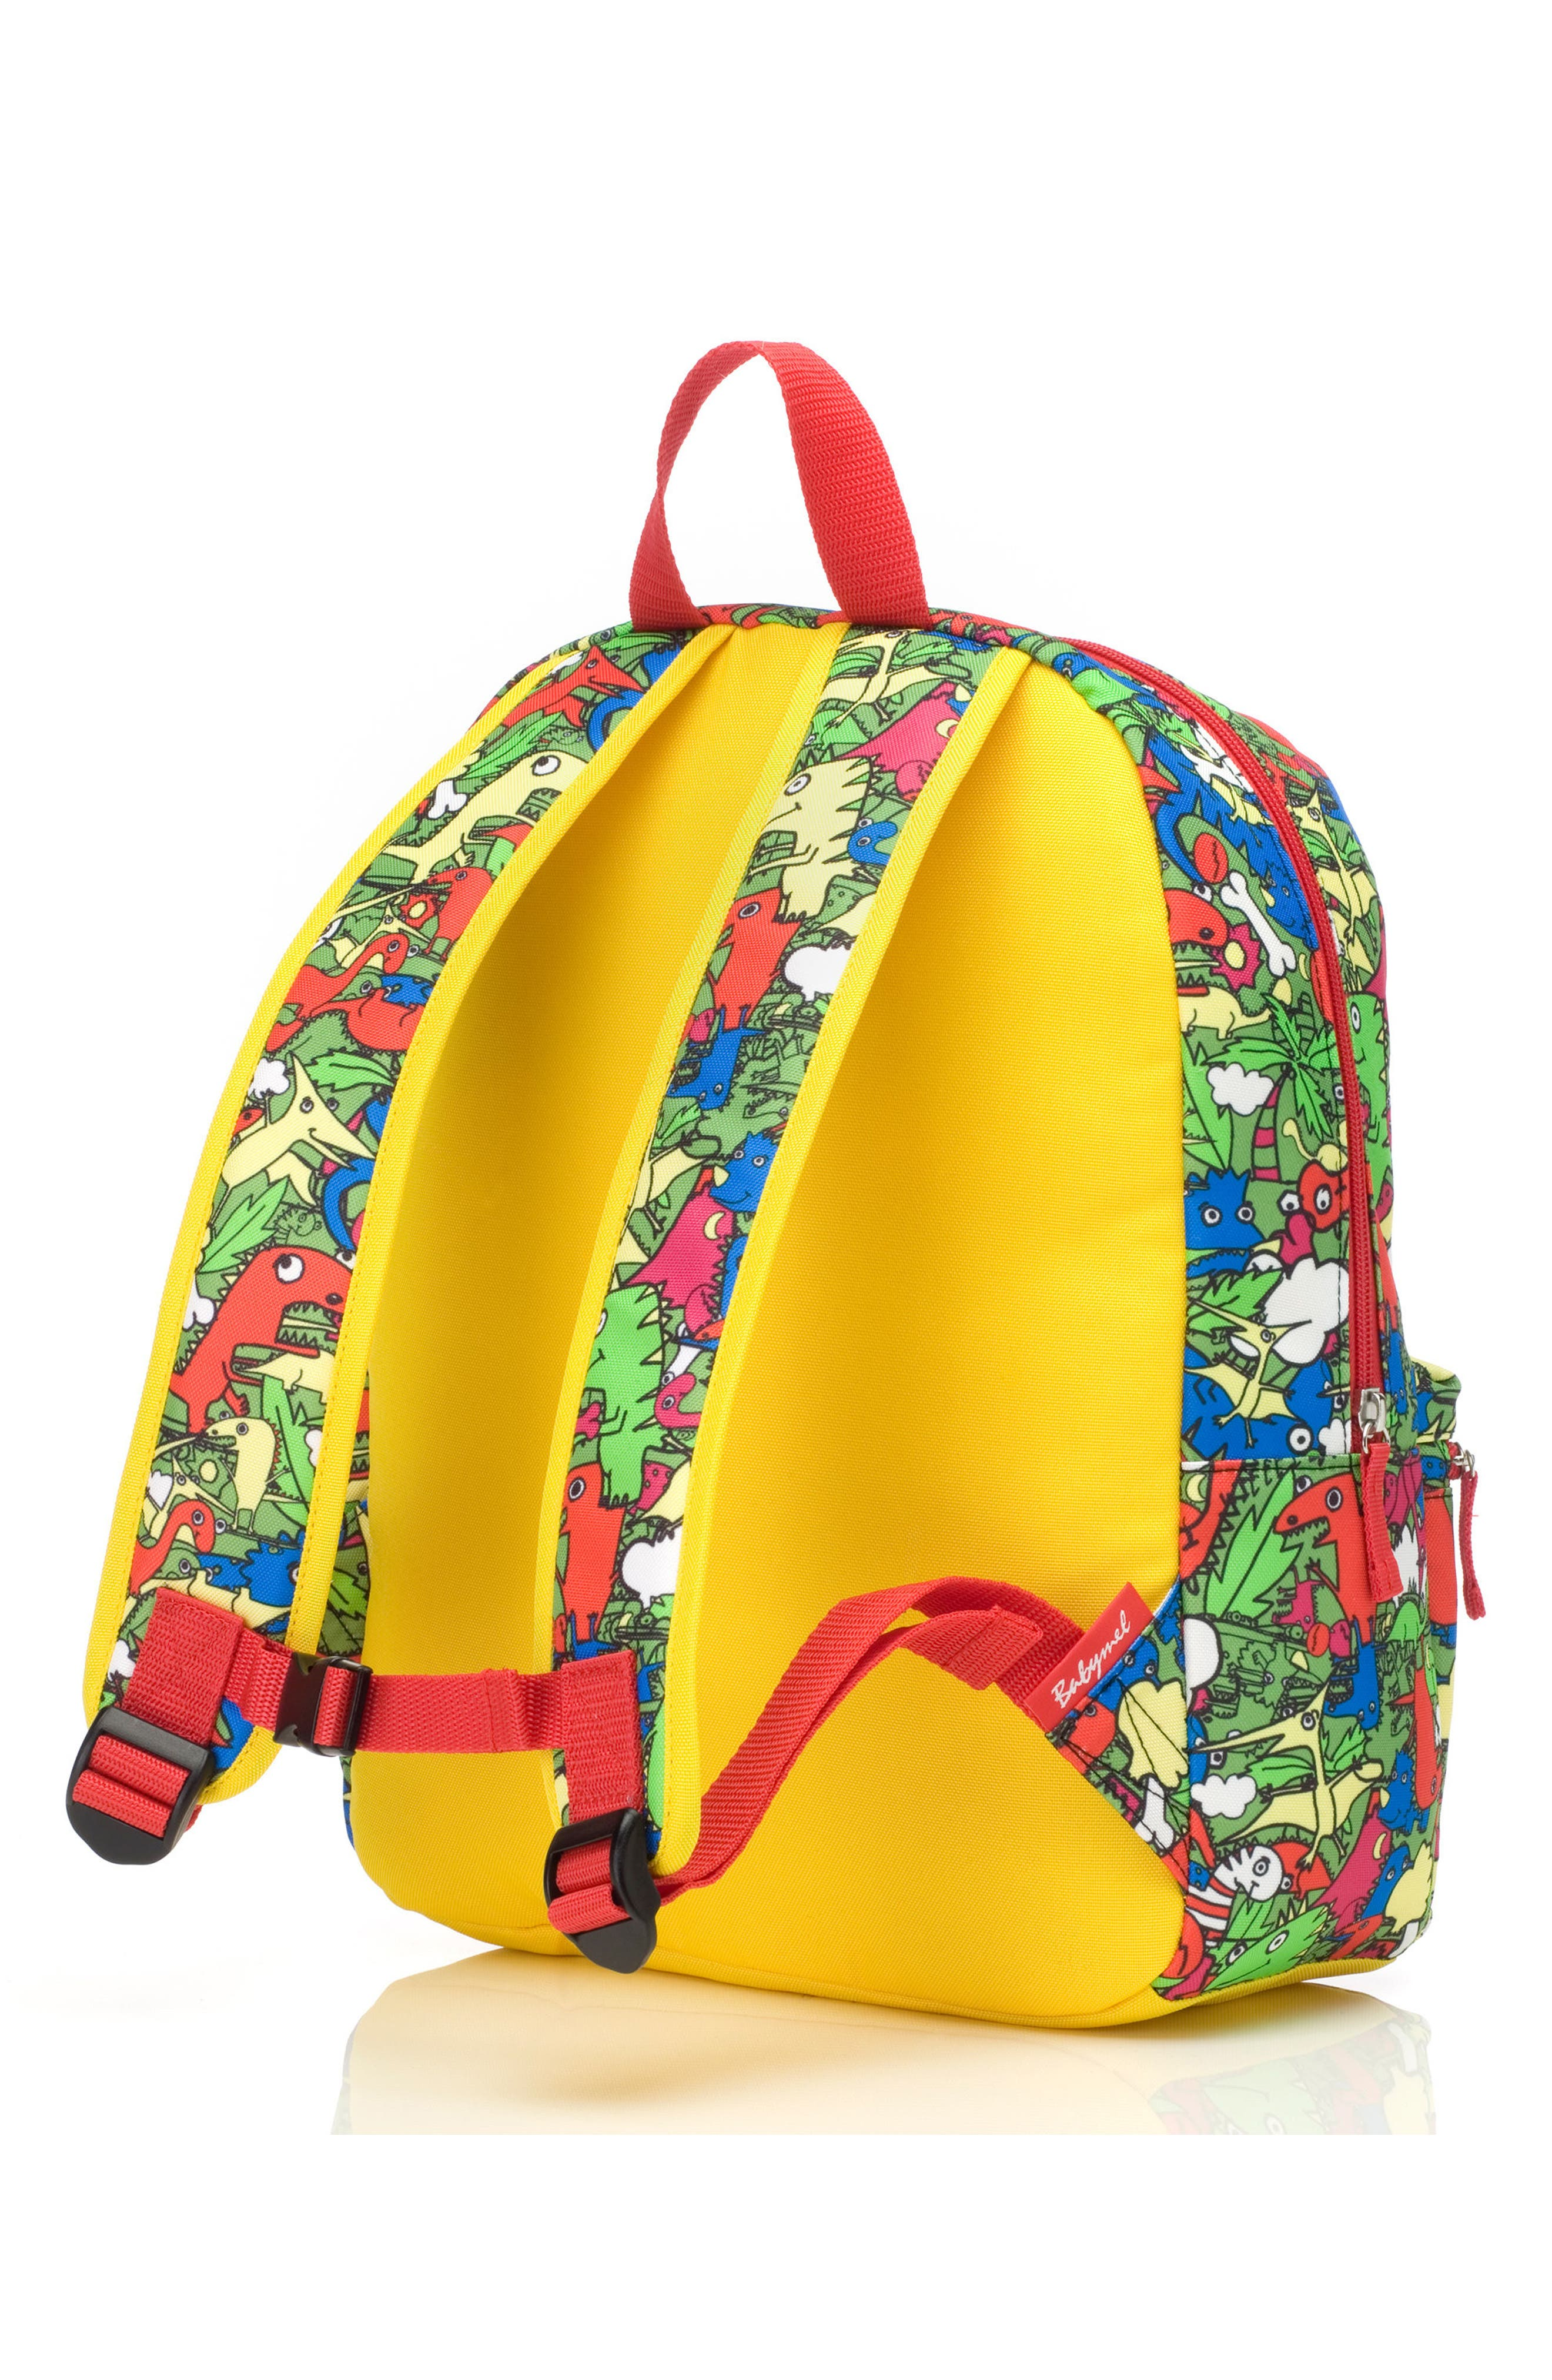 Zip & Zoe Junior Backpack Set,                             Alternate thumbnail 2, color,                             300